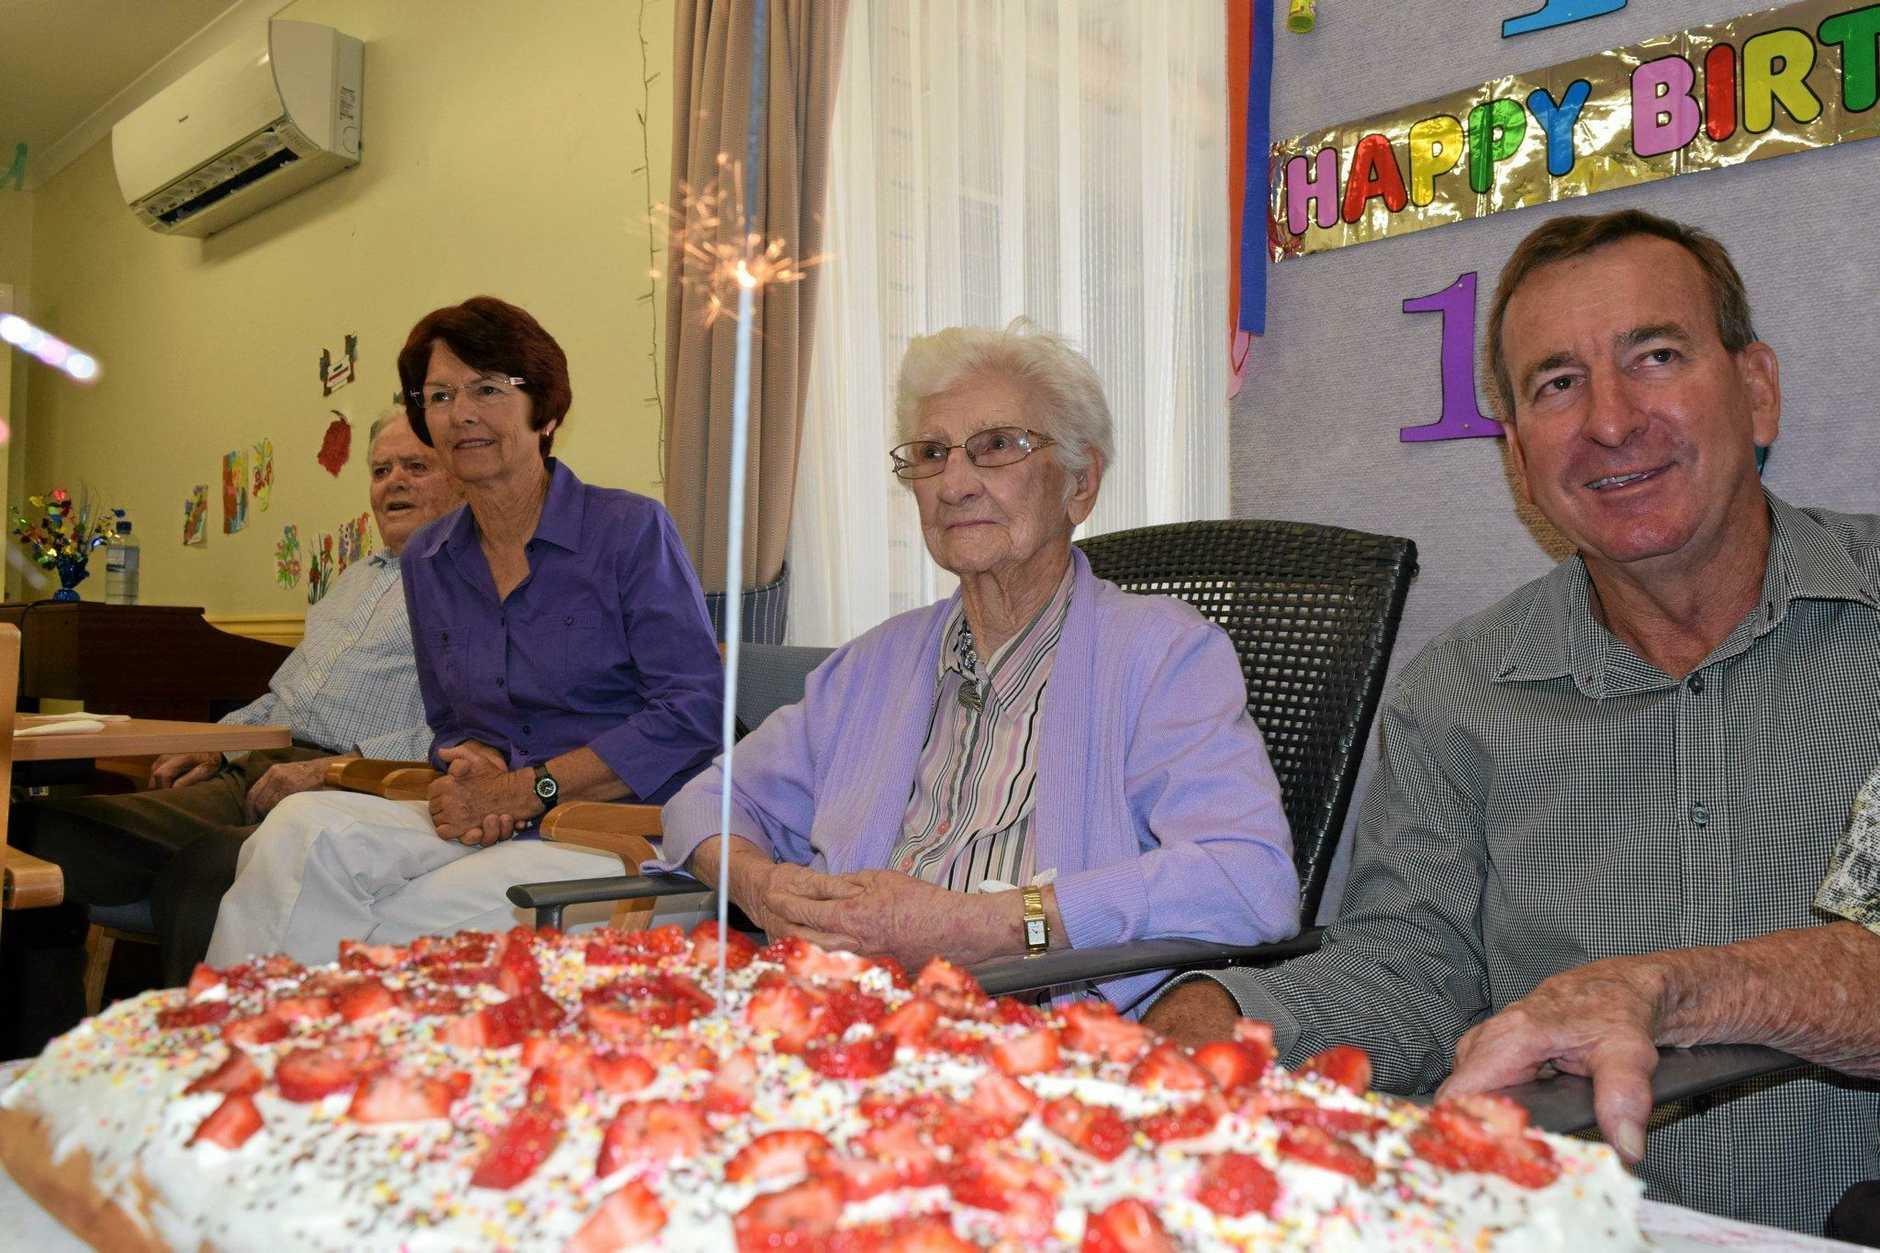 Pinaroo resident Olive Reade celebrated her 106th birthday alongside fellow resident Dexter Kruger, where she got a visit from mayor Robert Loughnan.